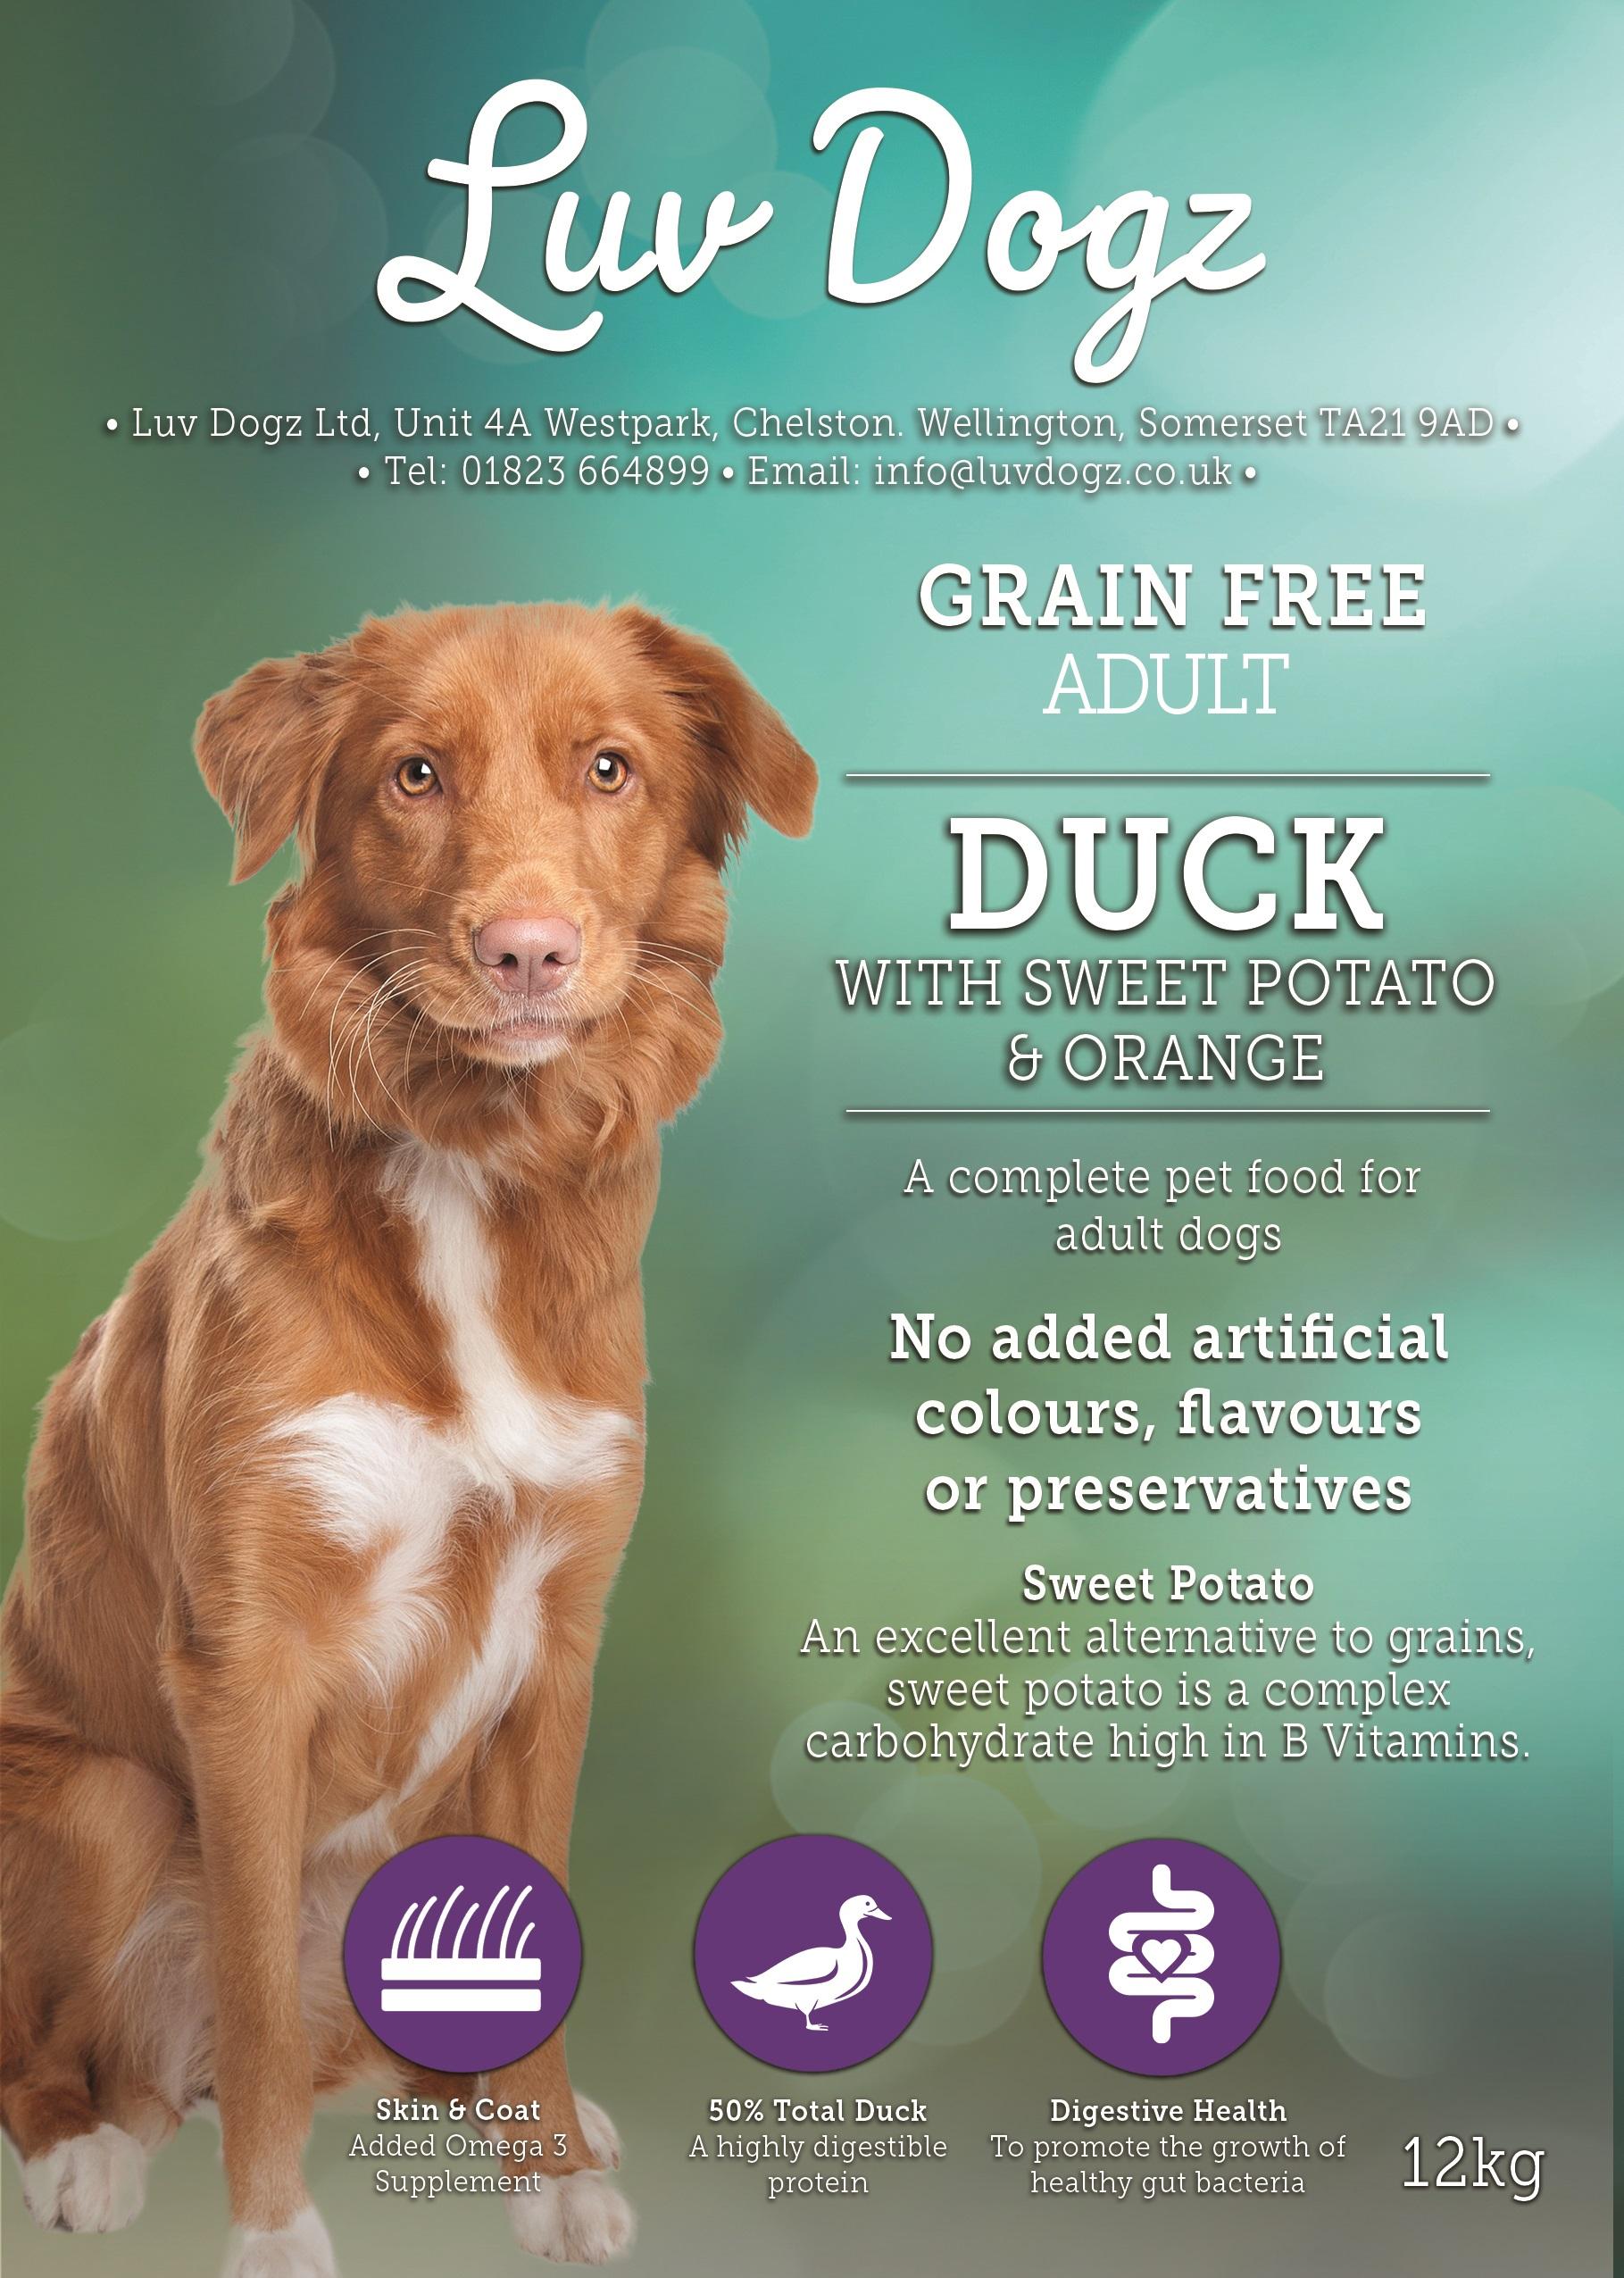 Grain Free Adult 50% Duck Sweet Potato Orange